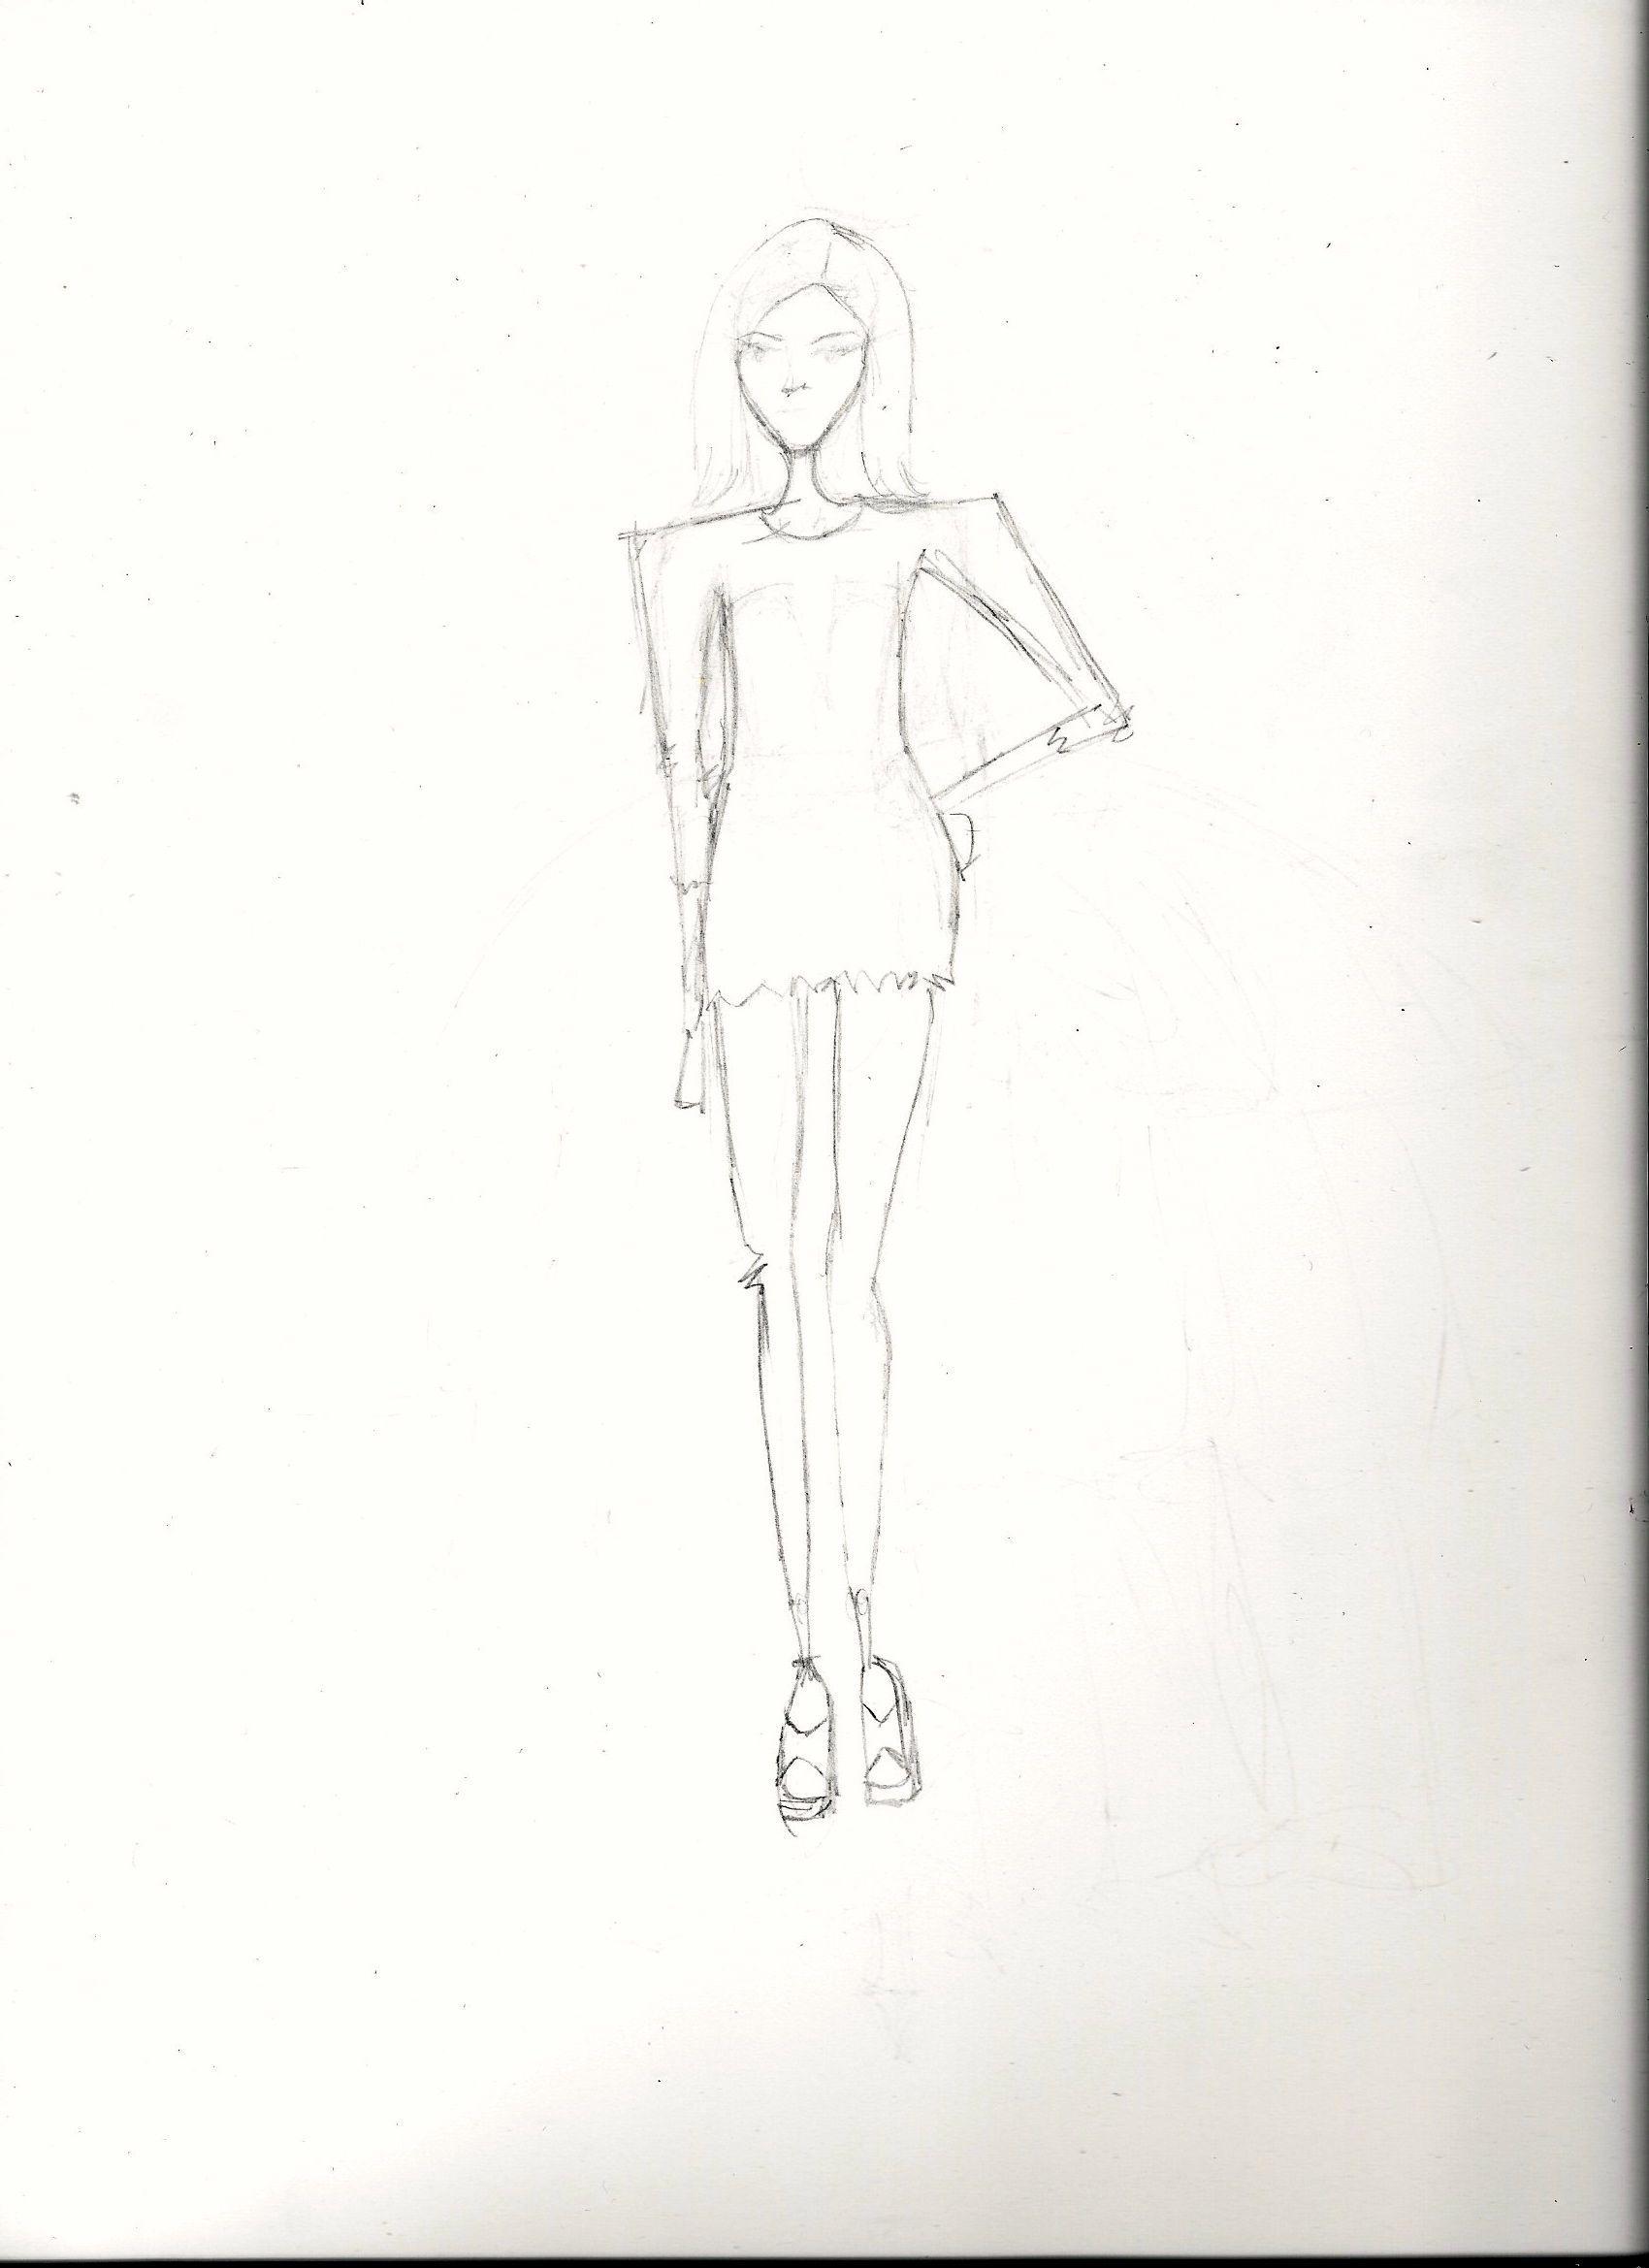 FINAL embellishment/watercolor Melissa Nadine fashion illustration - image 11 - student project